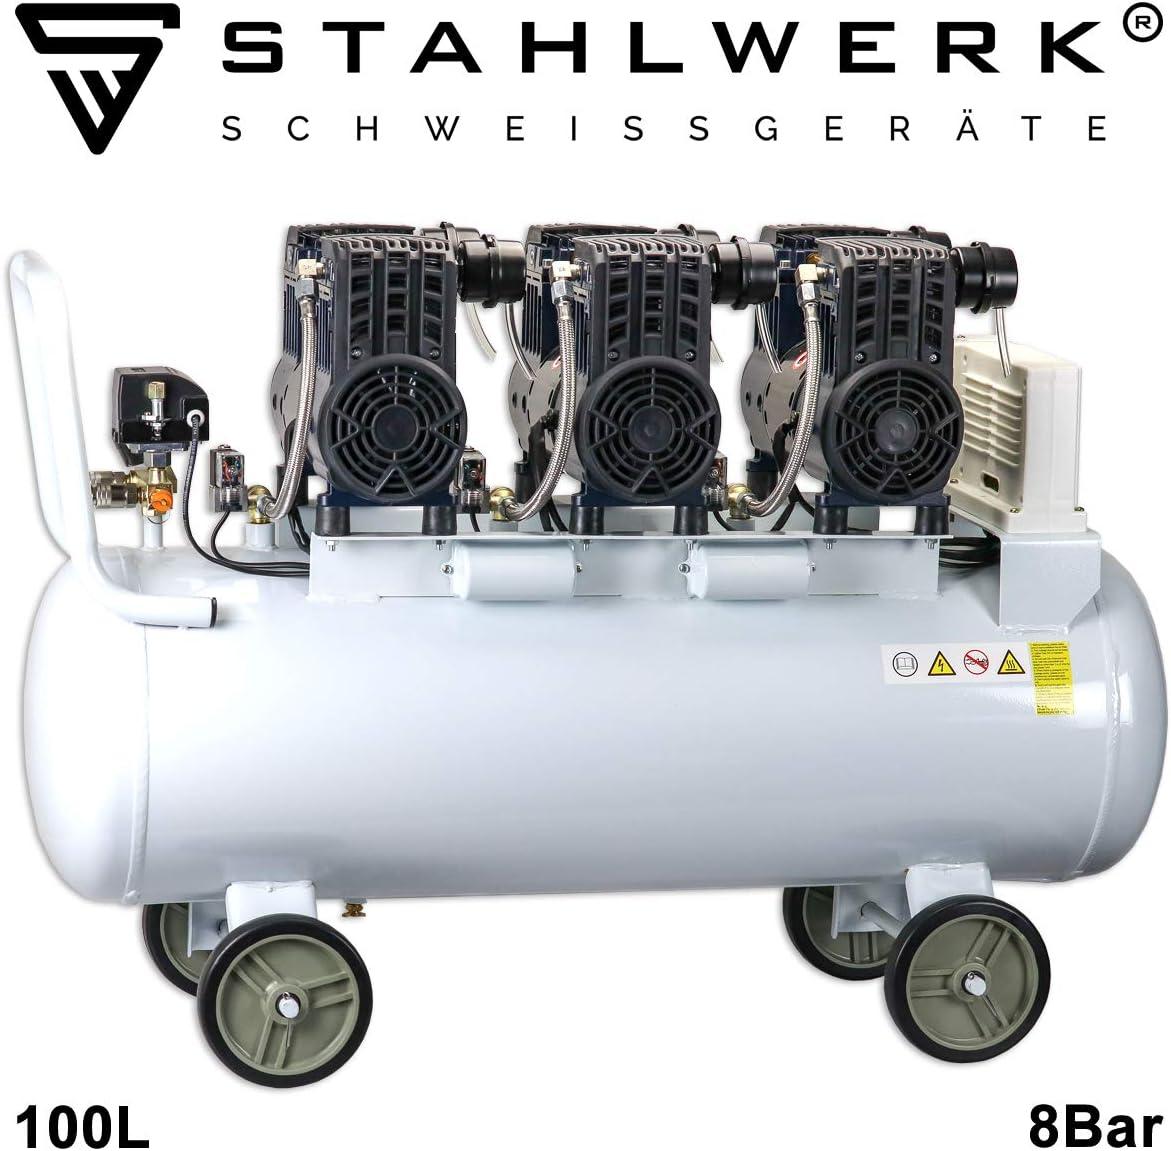 STAHLWERK ST 1008 pro - Compresor de aire a presión (100 L, 8 bar ...